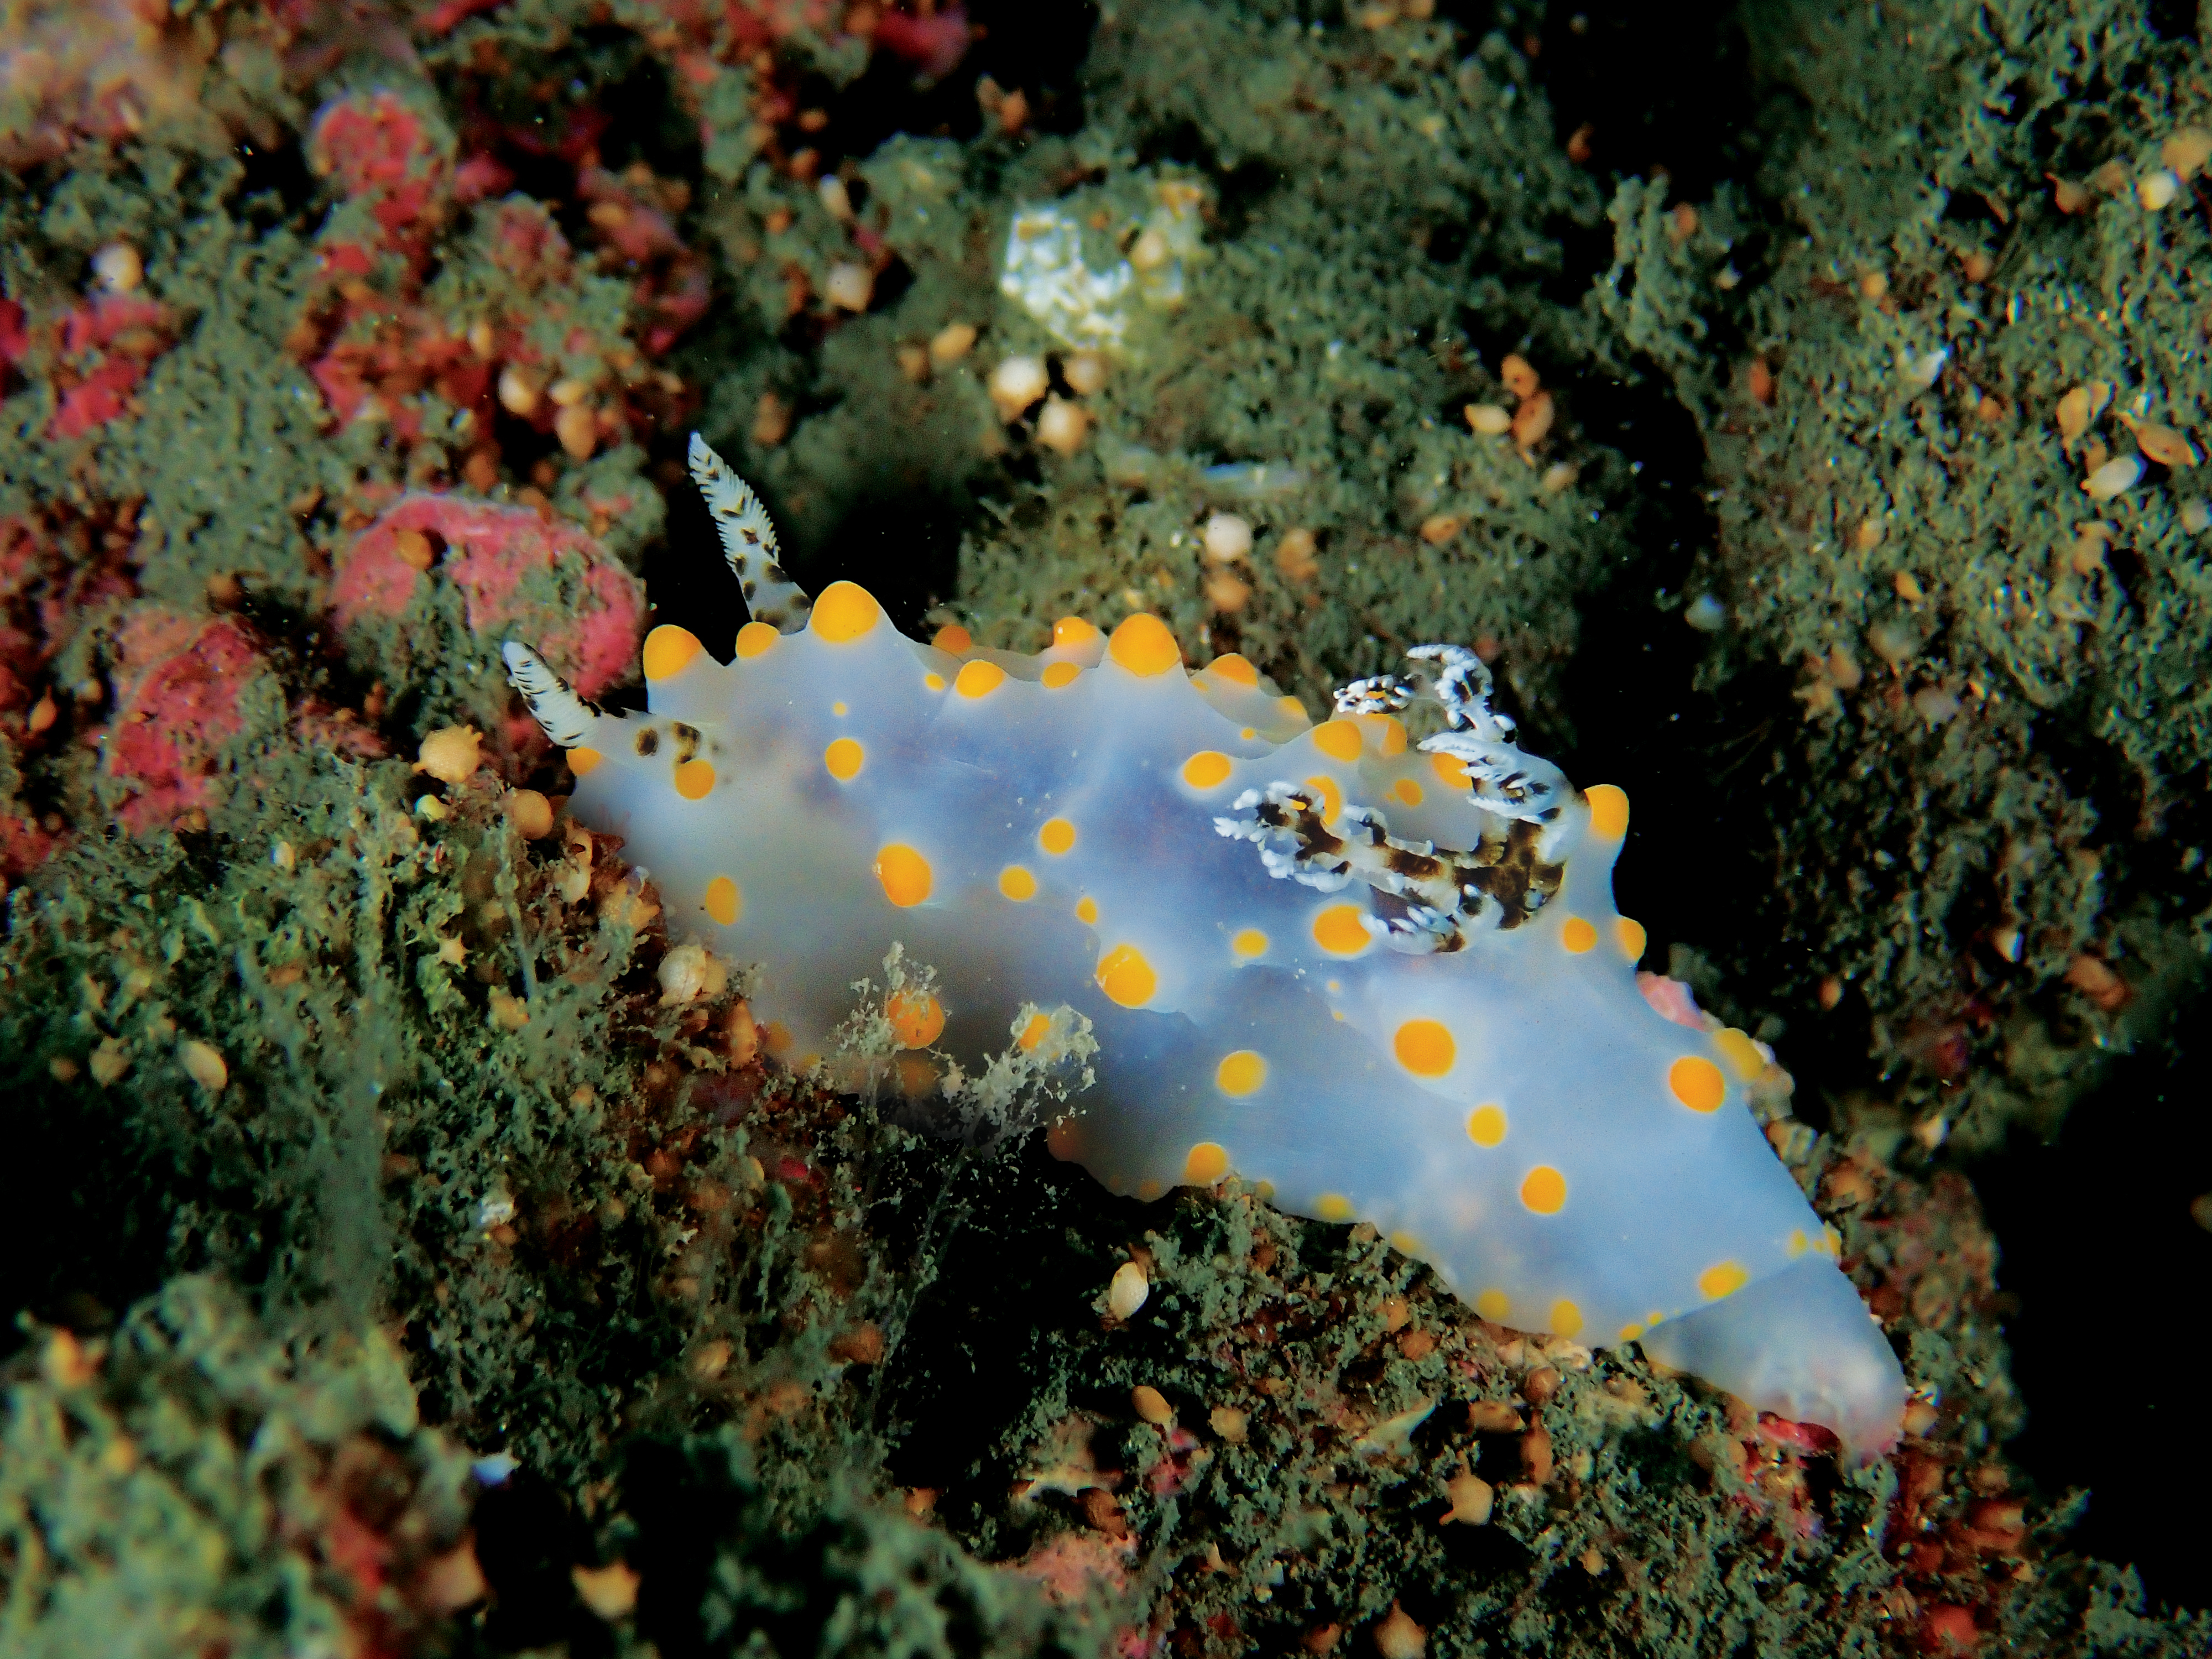 Philip Wong - 西吉城堡 - 卡爾森盤海蛞蝓